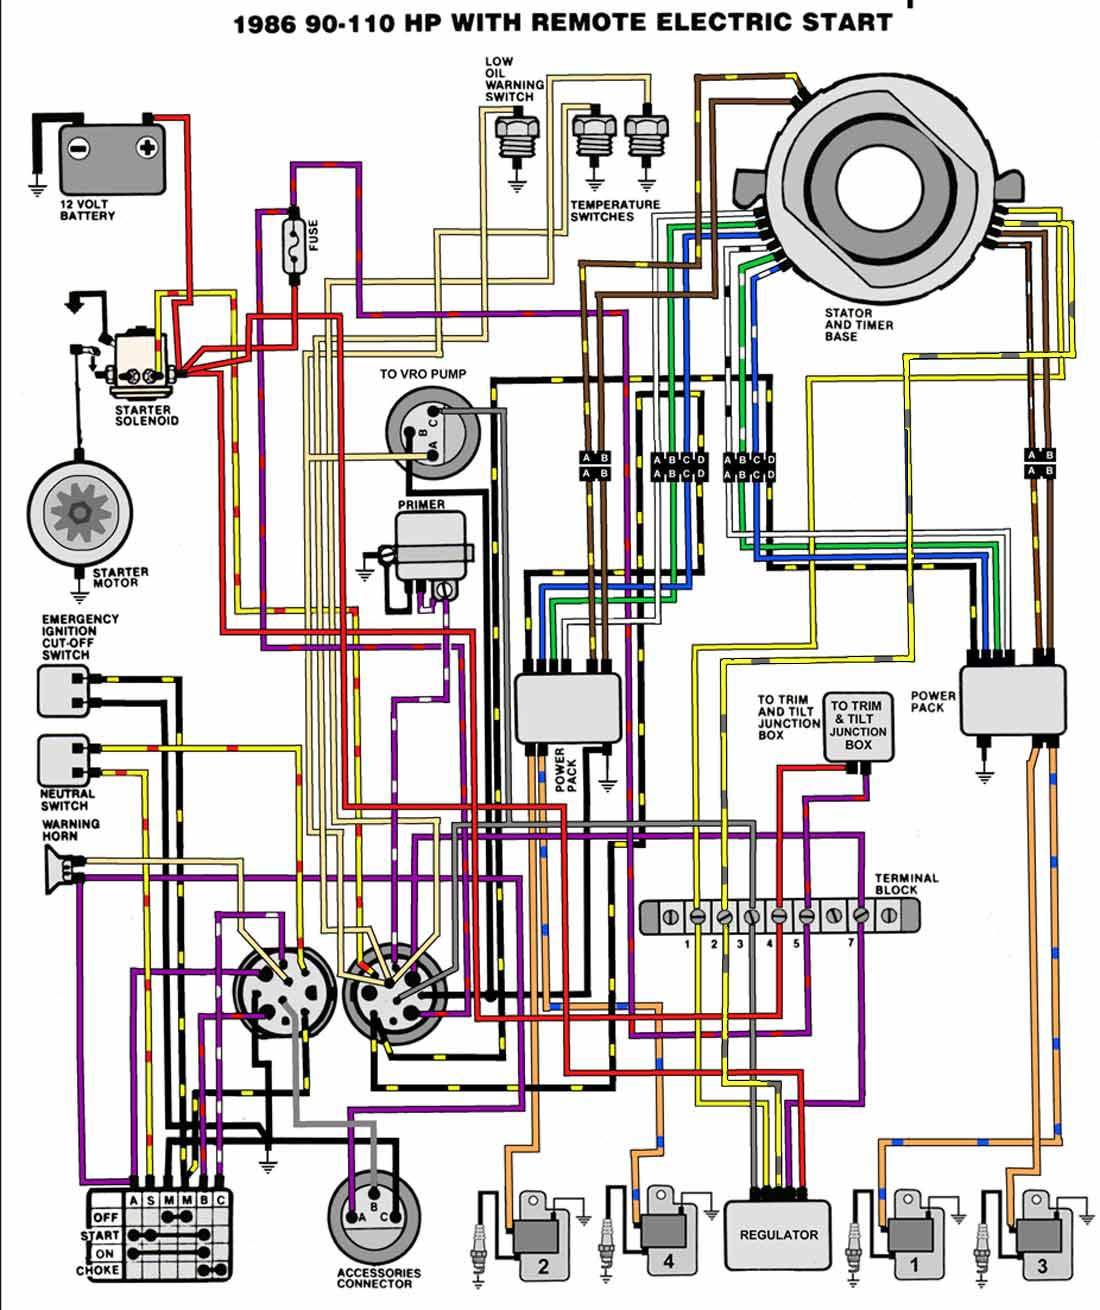 1986_90_115?resize=680%2C810 wiring diagram 1977 johnson johnson switch diagram, johnson  at arjmand.co